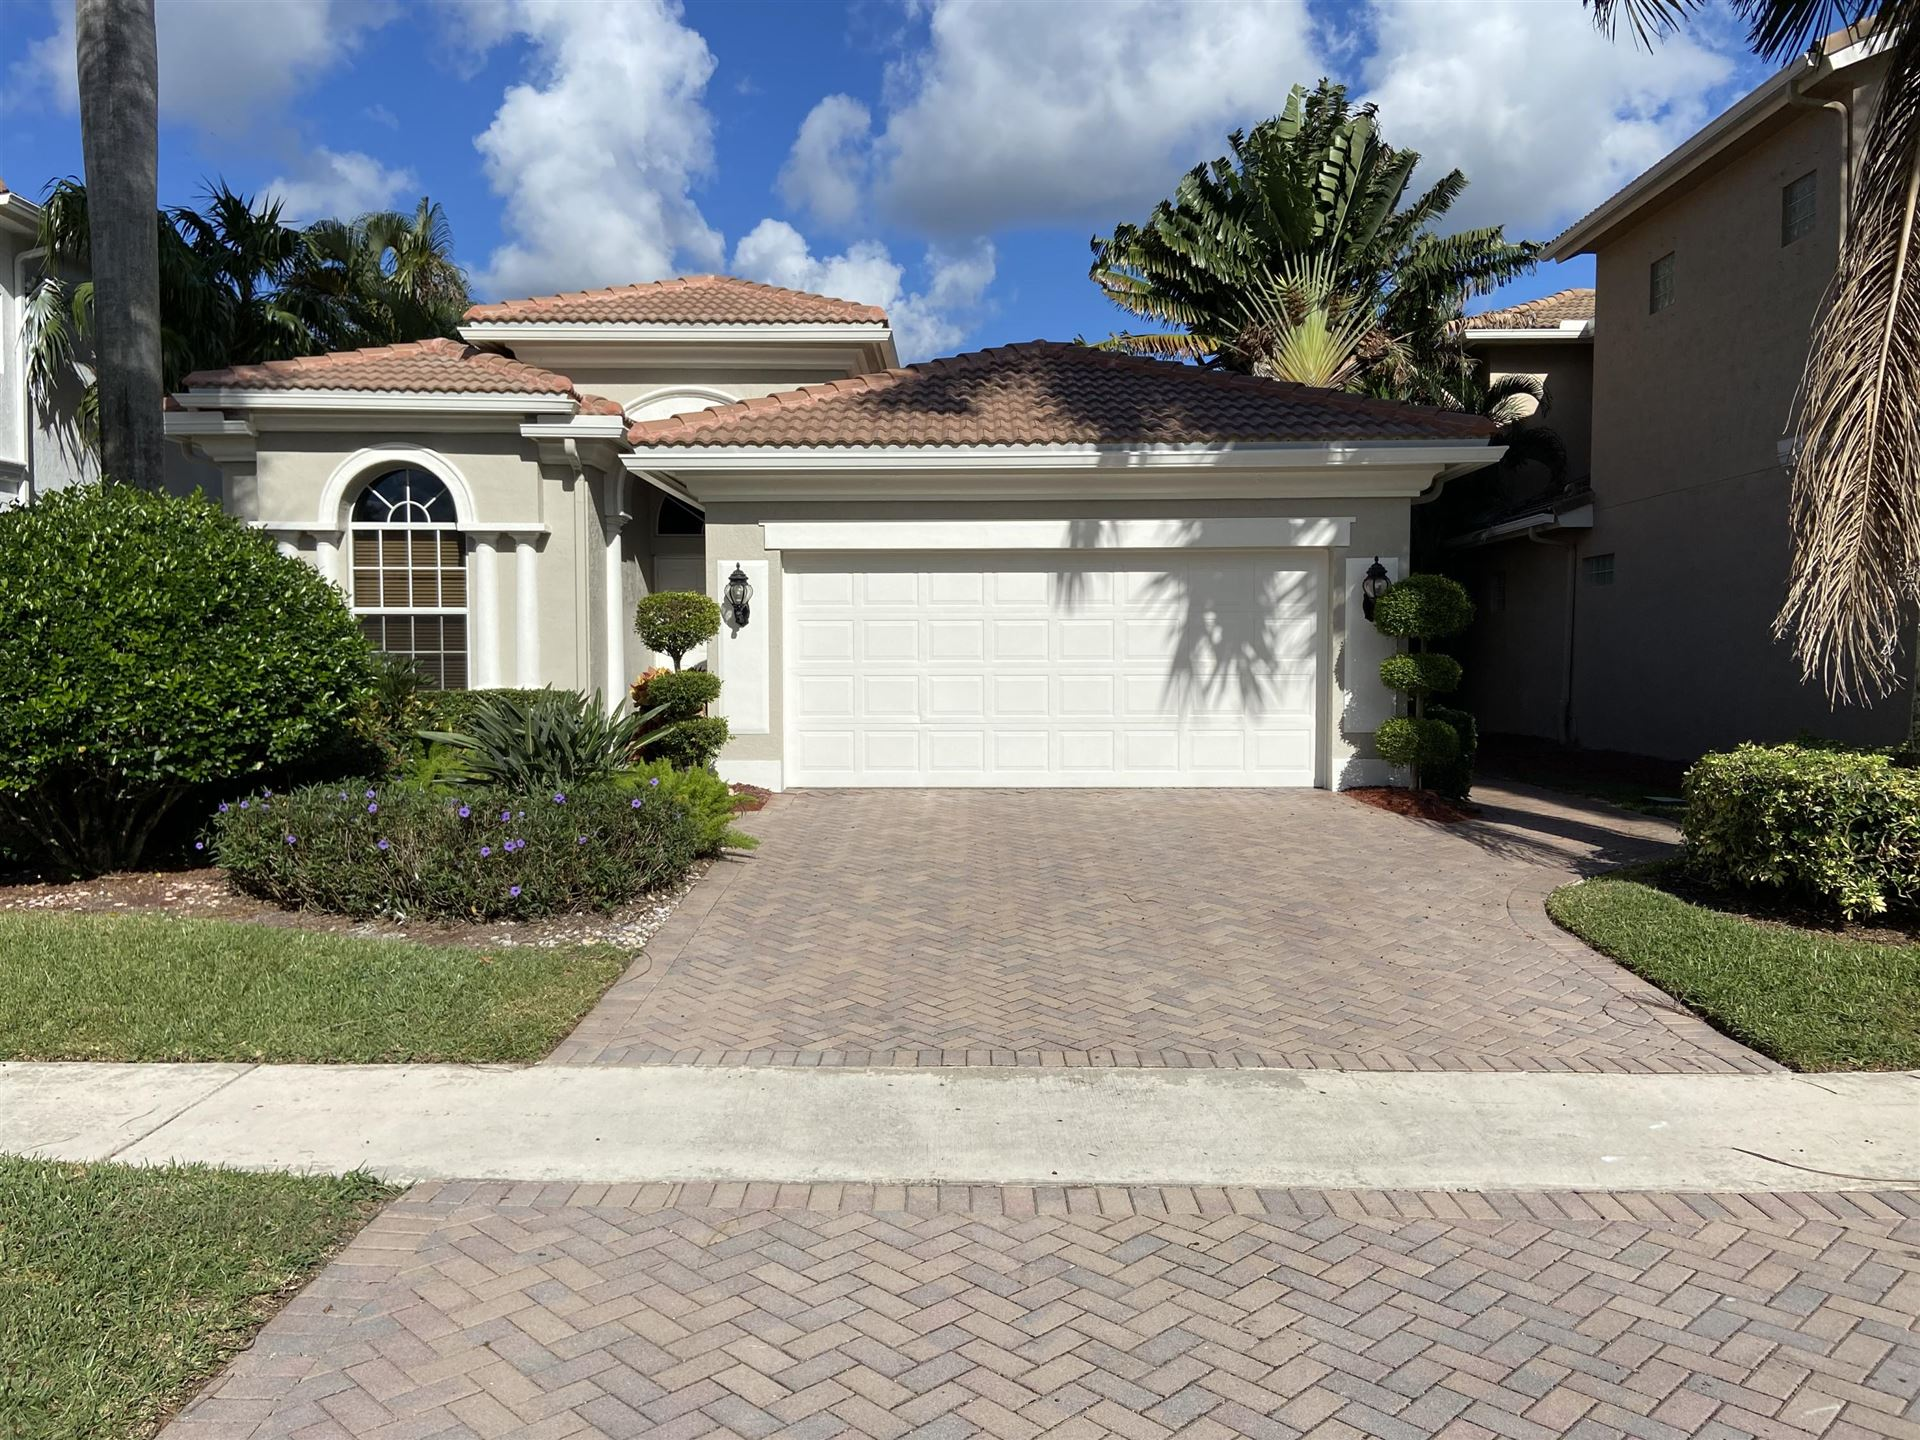 Photo of 8101 Valhalla Drive, Delray Beach, FL 33446 (MLS # RX-10675775)